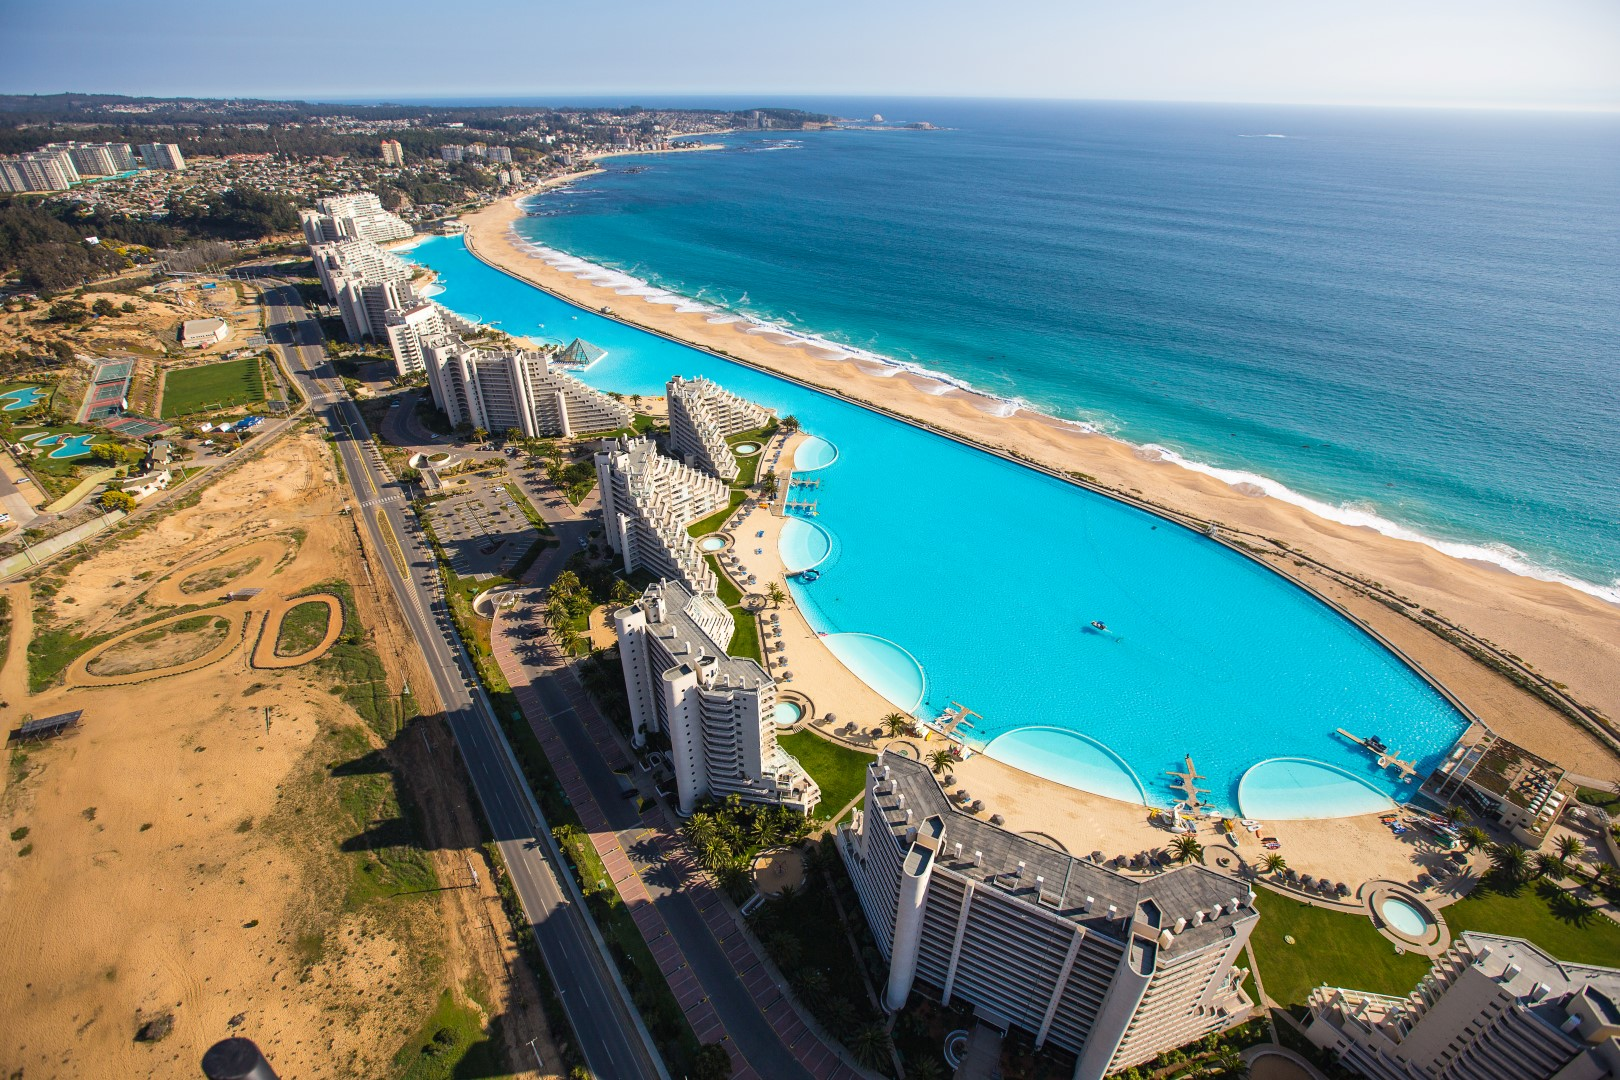 Combien mesure la plus grande piscine du monde for Piscine du monde